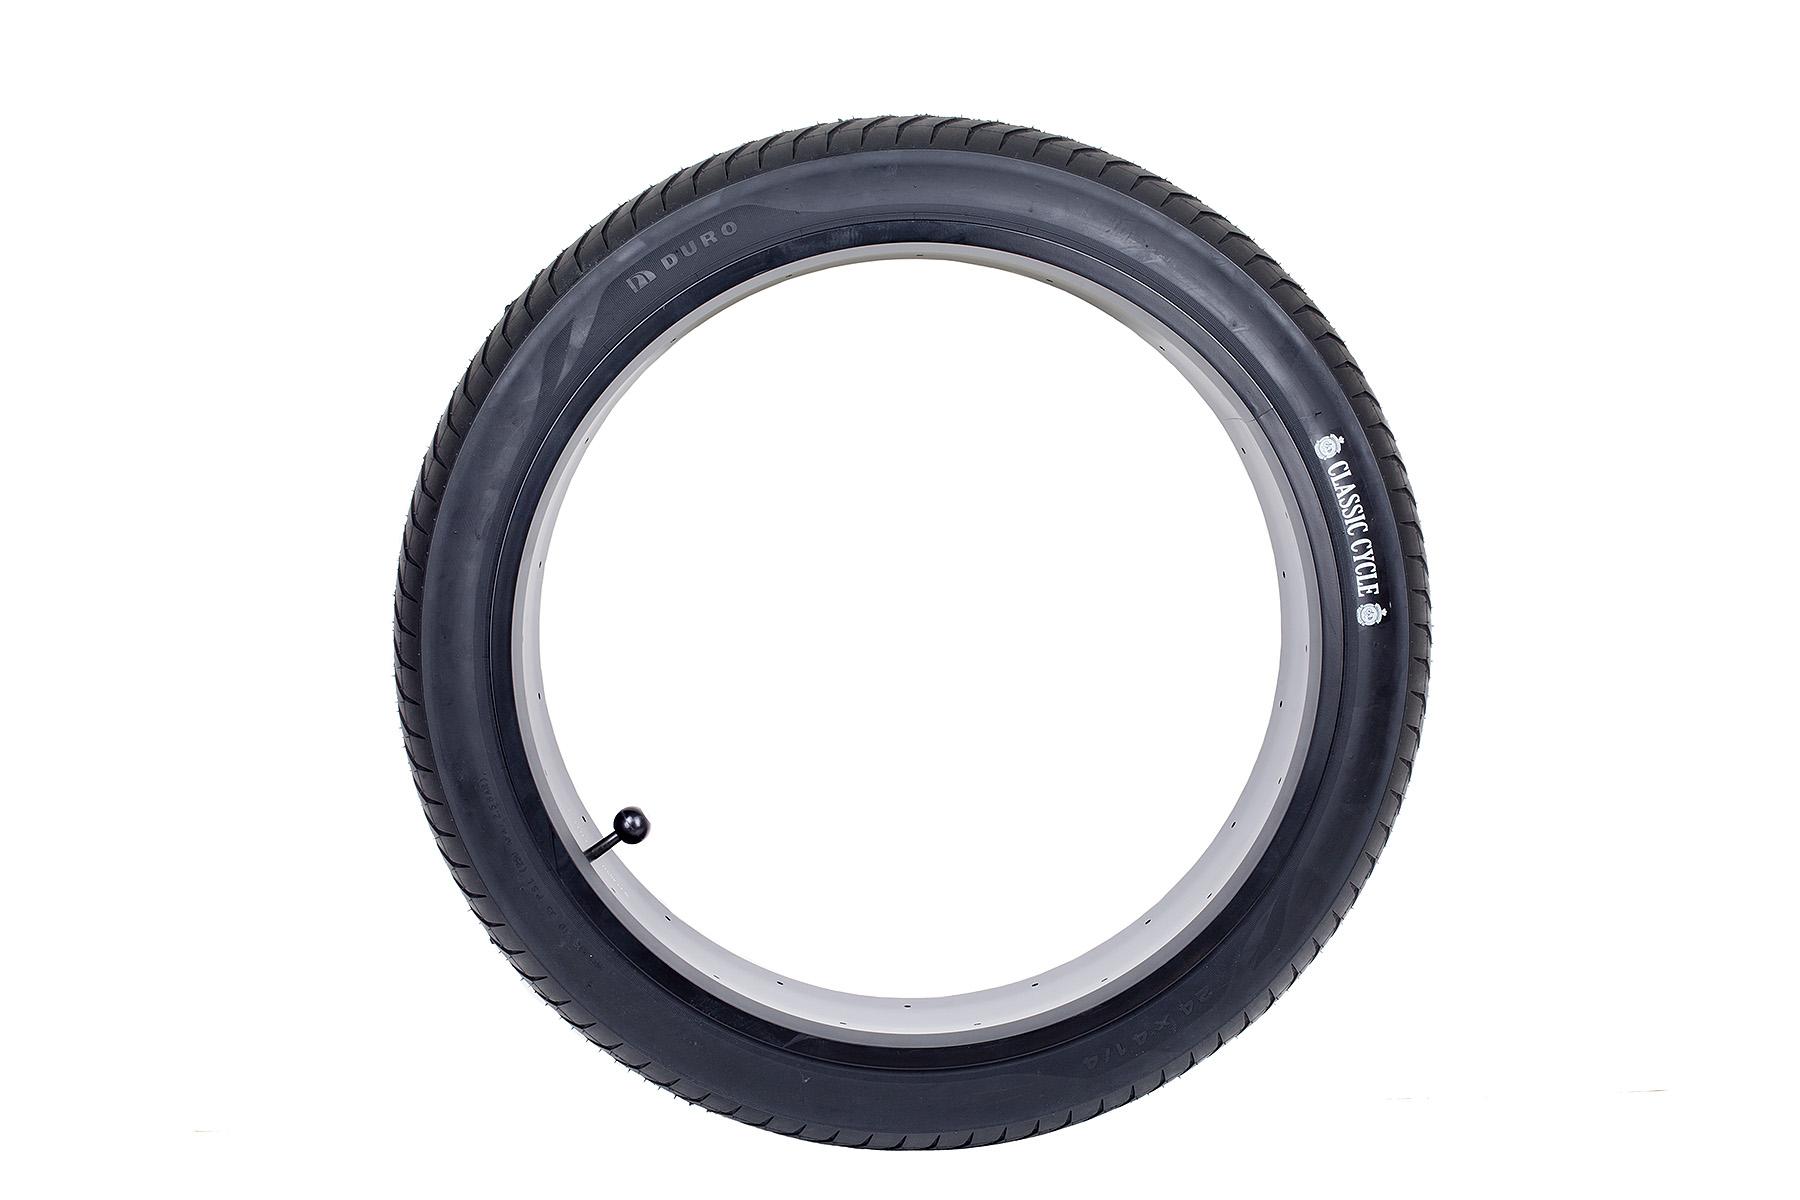 Weißwand Reifen 24 x 4 1//4 Zoll Street Hog III